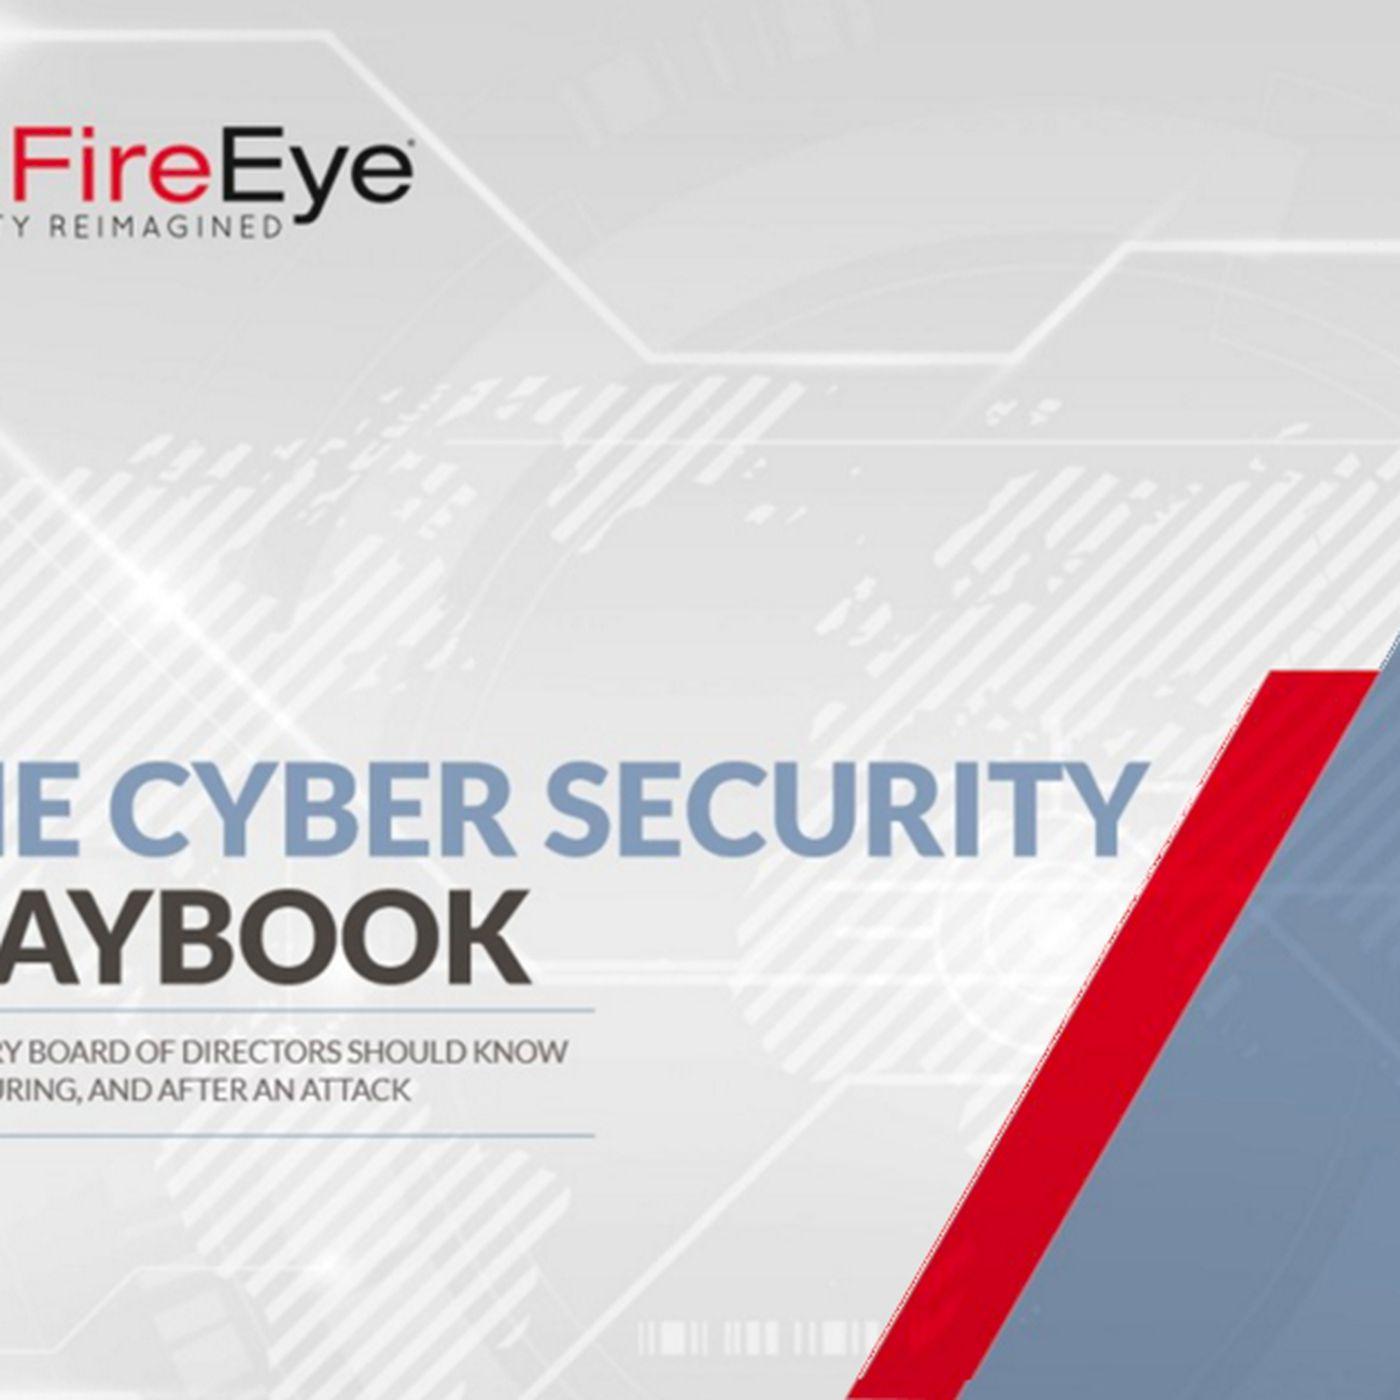 FireEye Raises Revenue Forecast as Demand for Cybersecurity